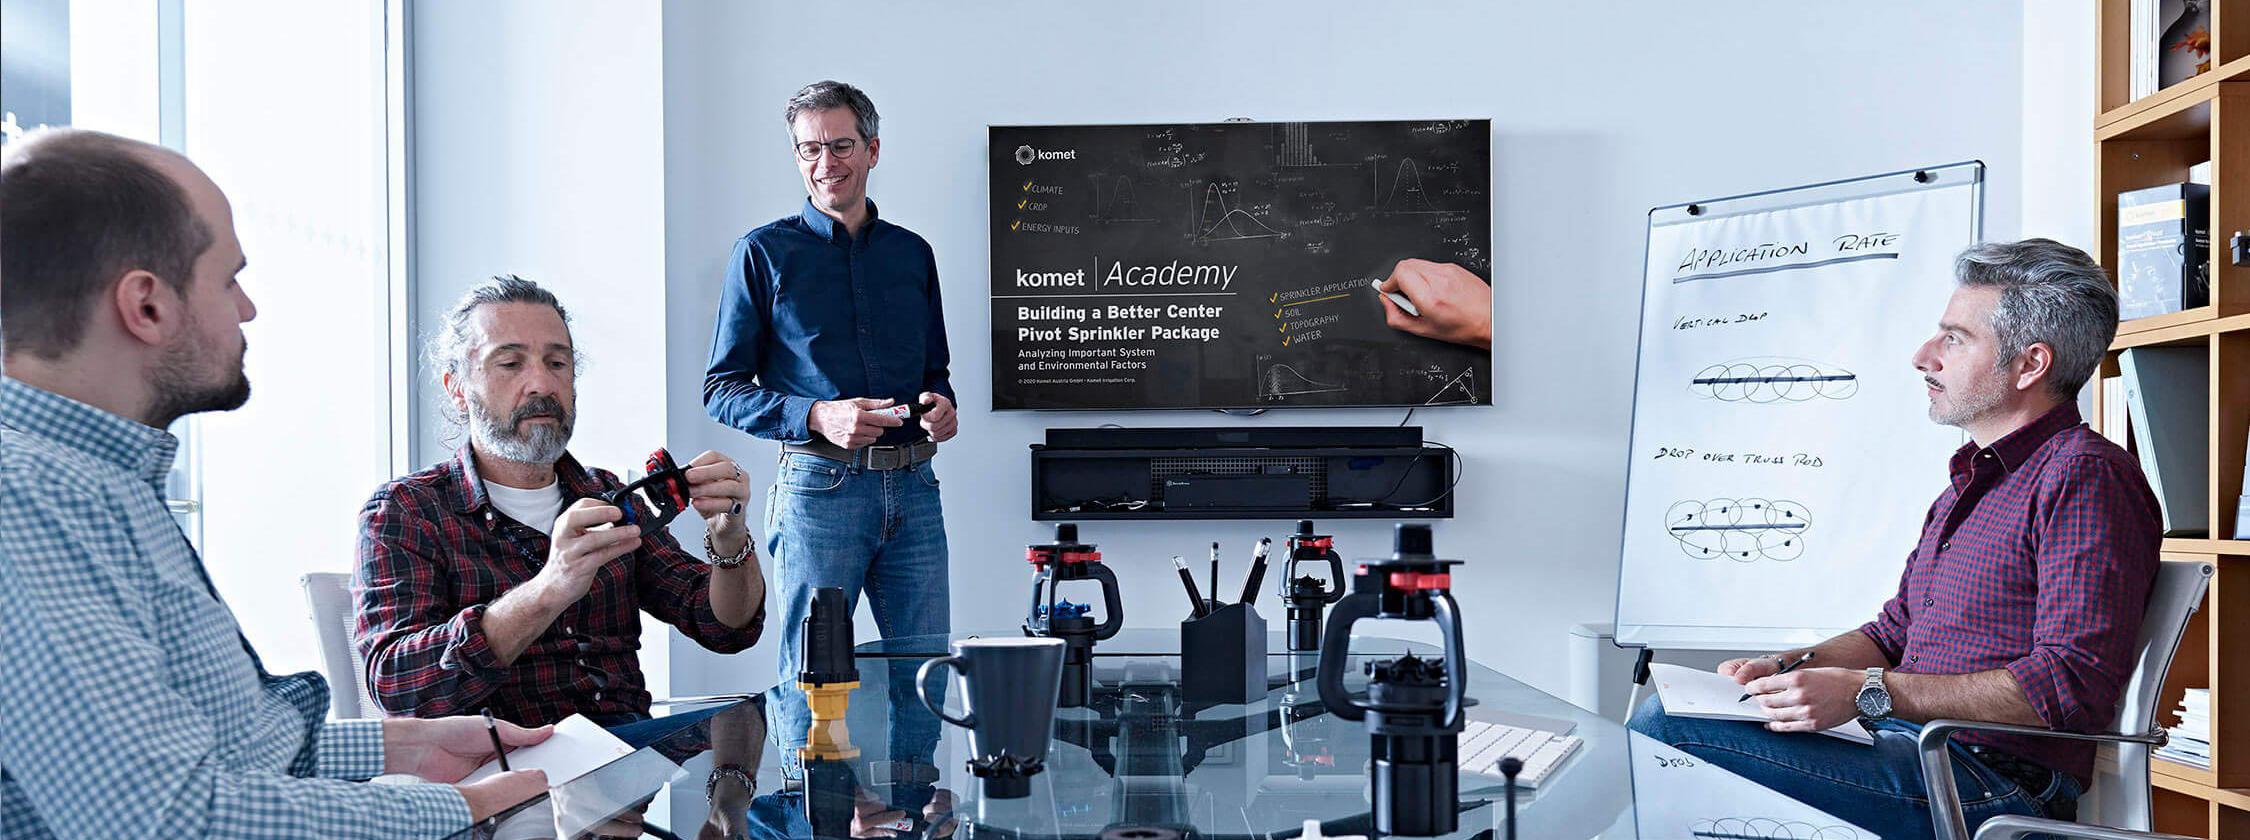 Komet Academy